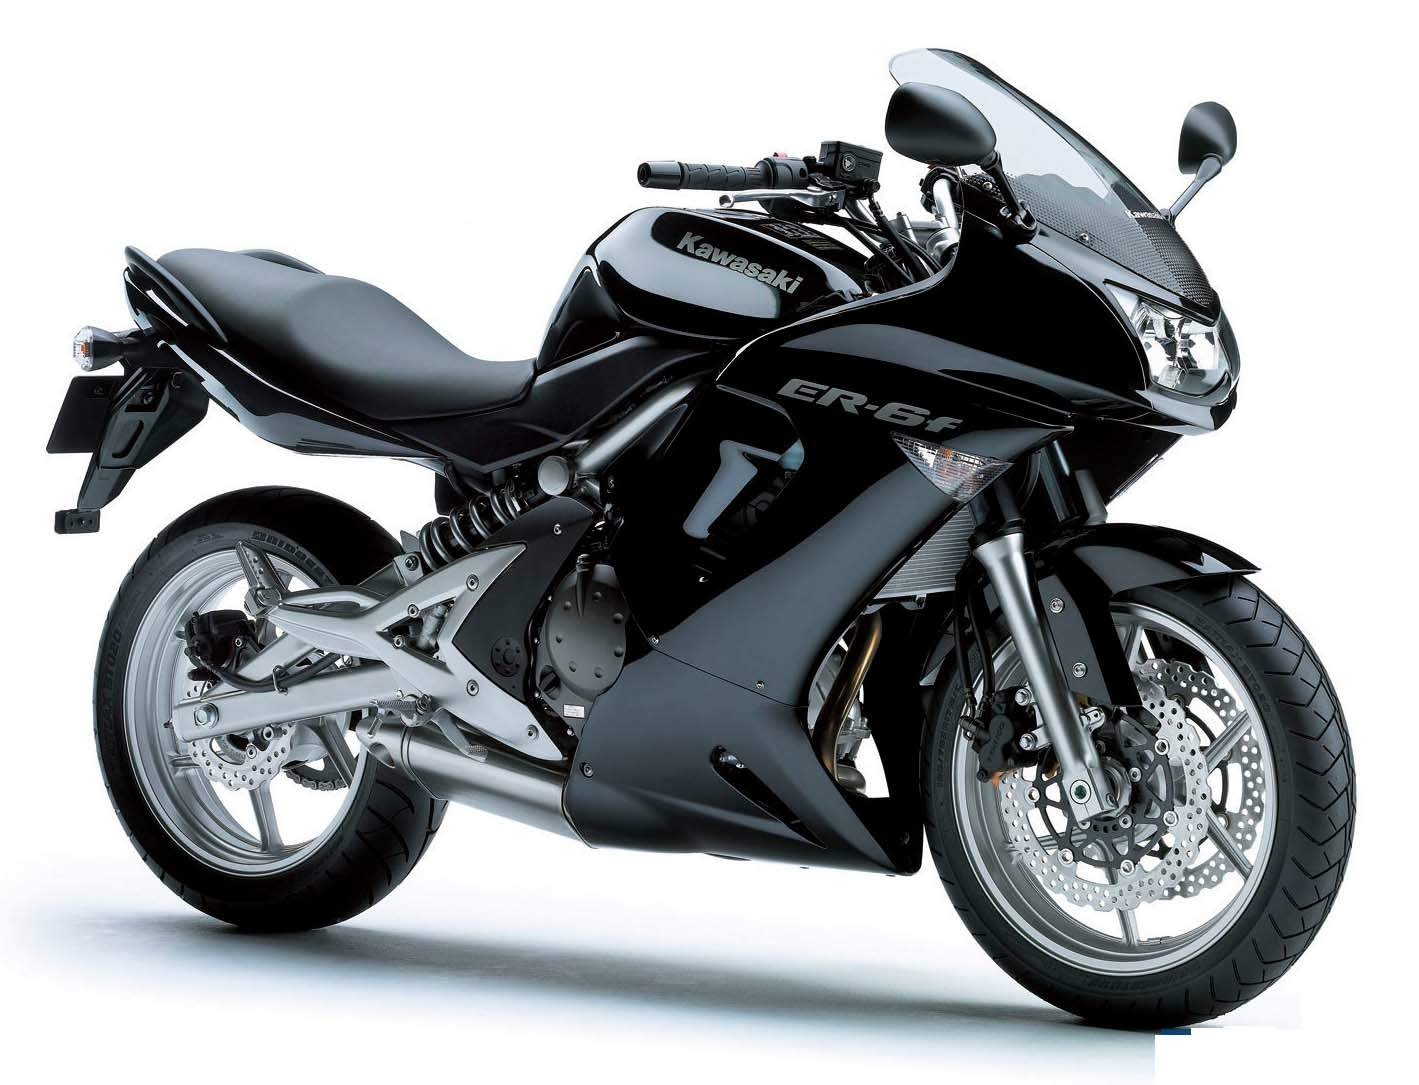 Мотоцикл kawasaki er-6f 2007 Описание, Фото, Запчасти, Цена